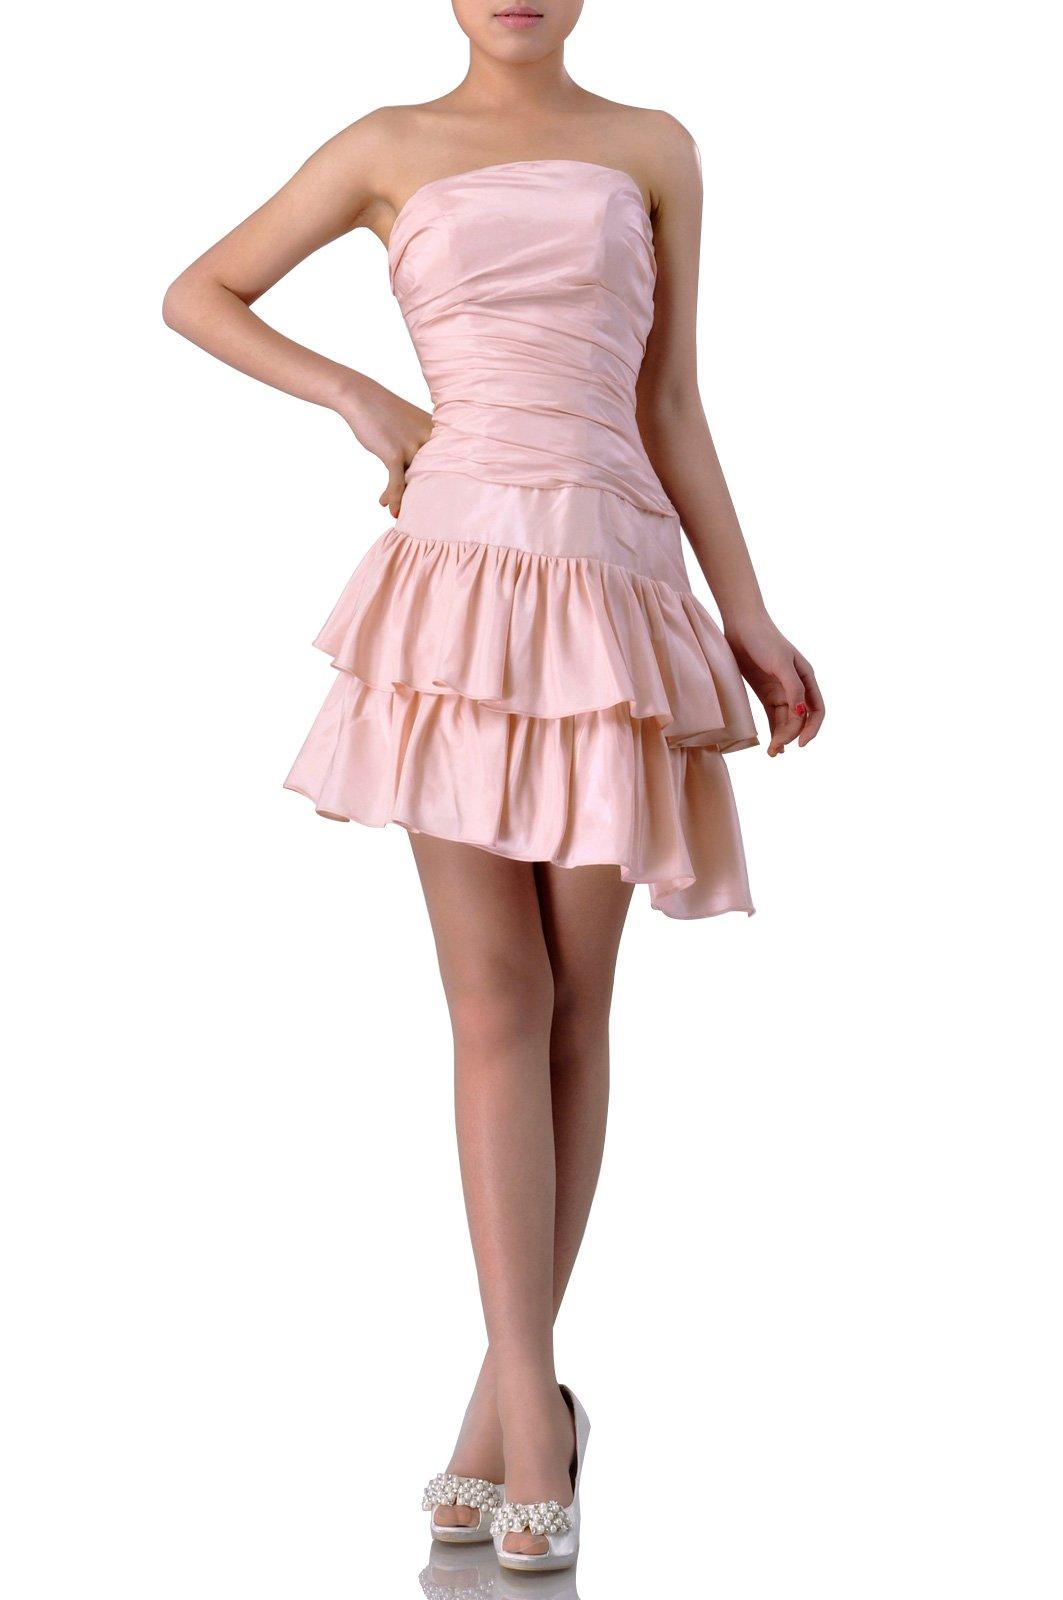 Taffeta Natrual Bateau Short Strapless Homecoming Modest Bridesmaid Dress Short, Color White,14 by Adorona (Image #1)